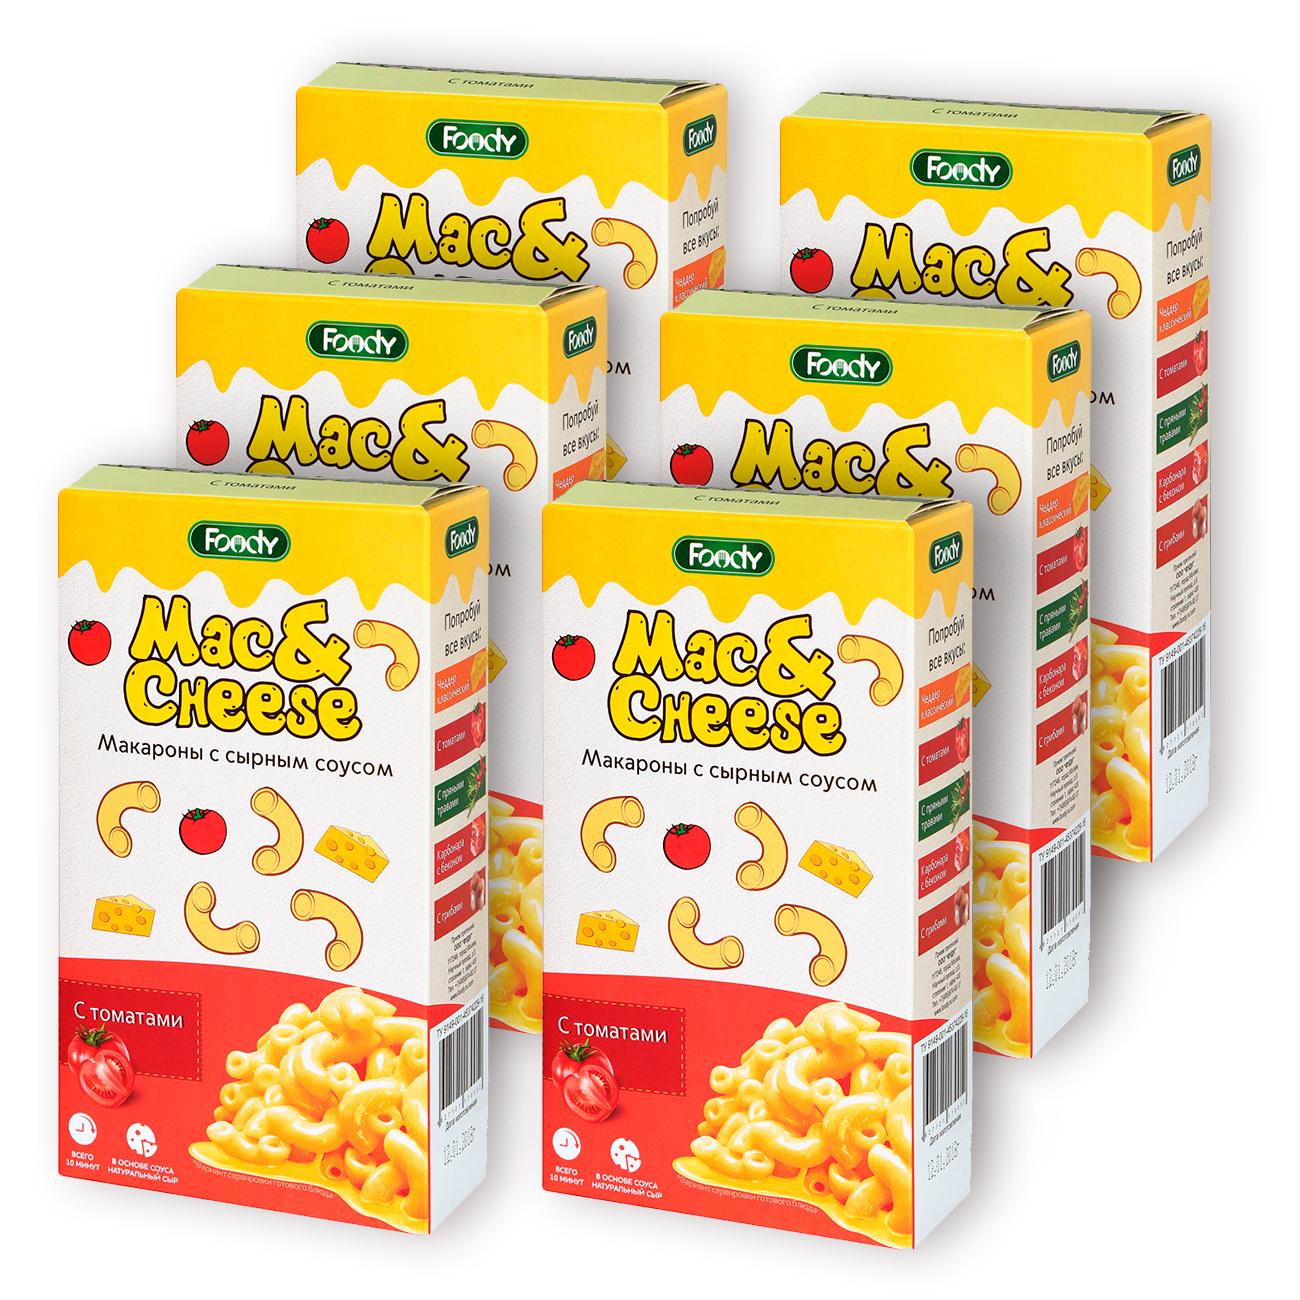 Foody Mac&Cheese С томатами макароны с сырным соусом, 143г х 6шт